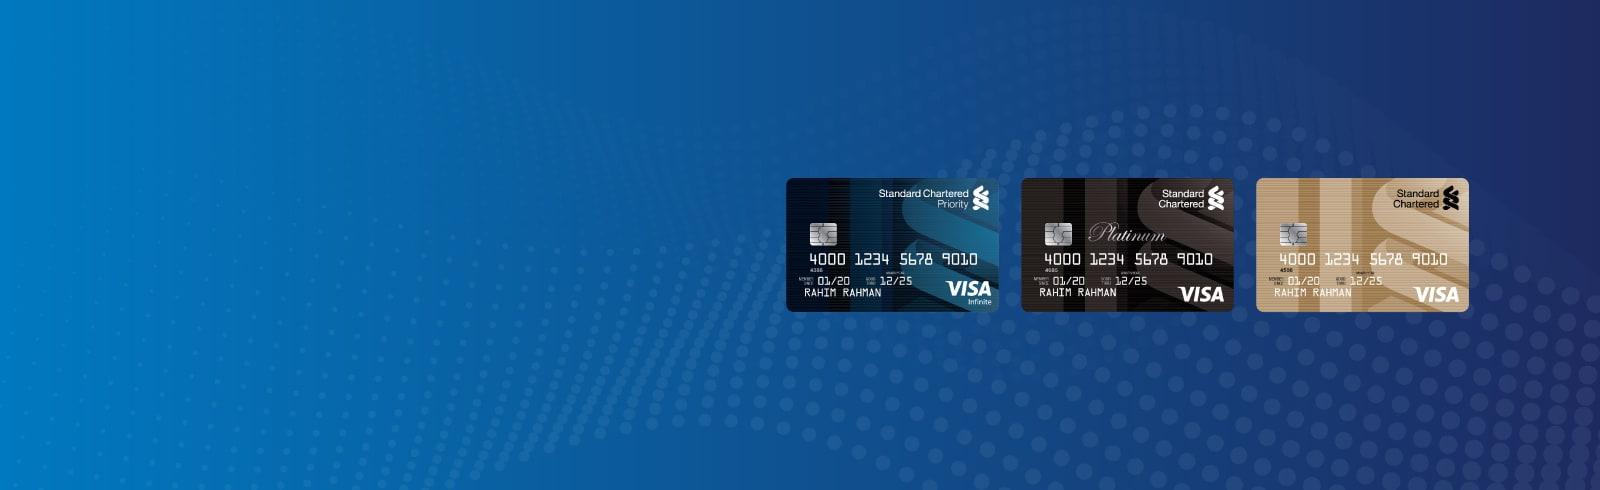 Bn olympic games tokyo banner existing visa card x y